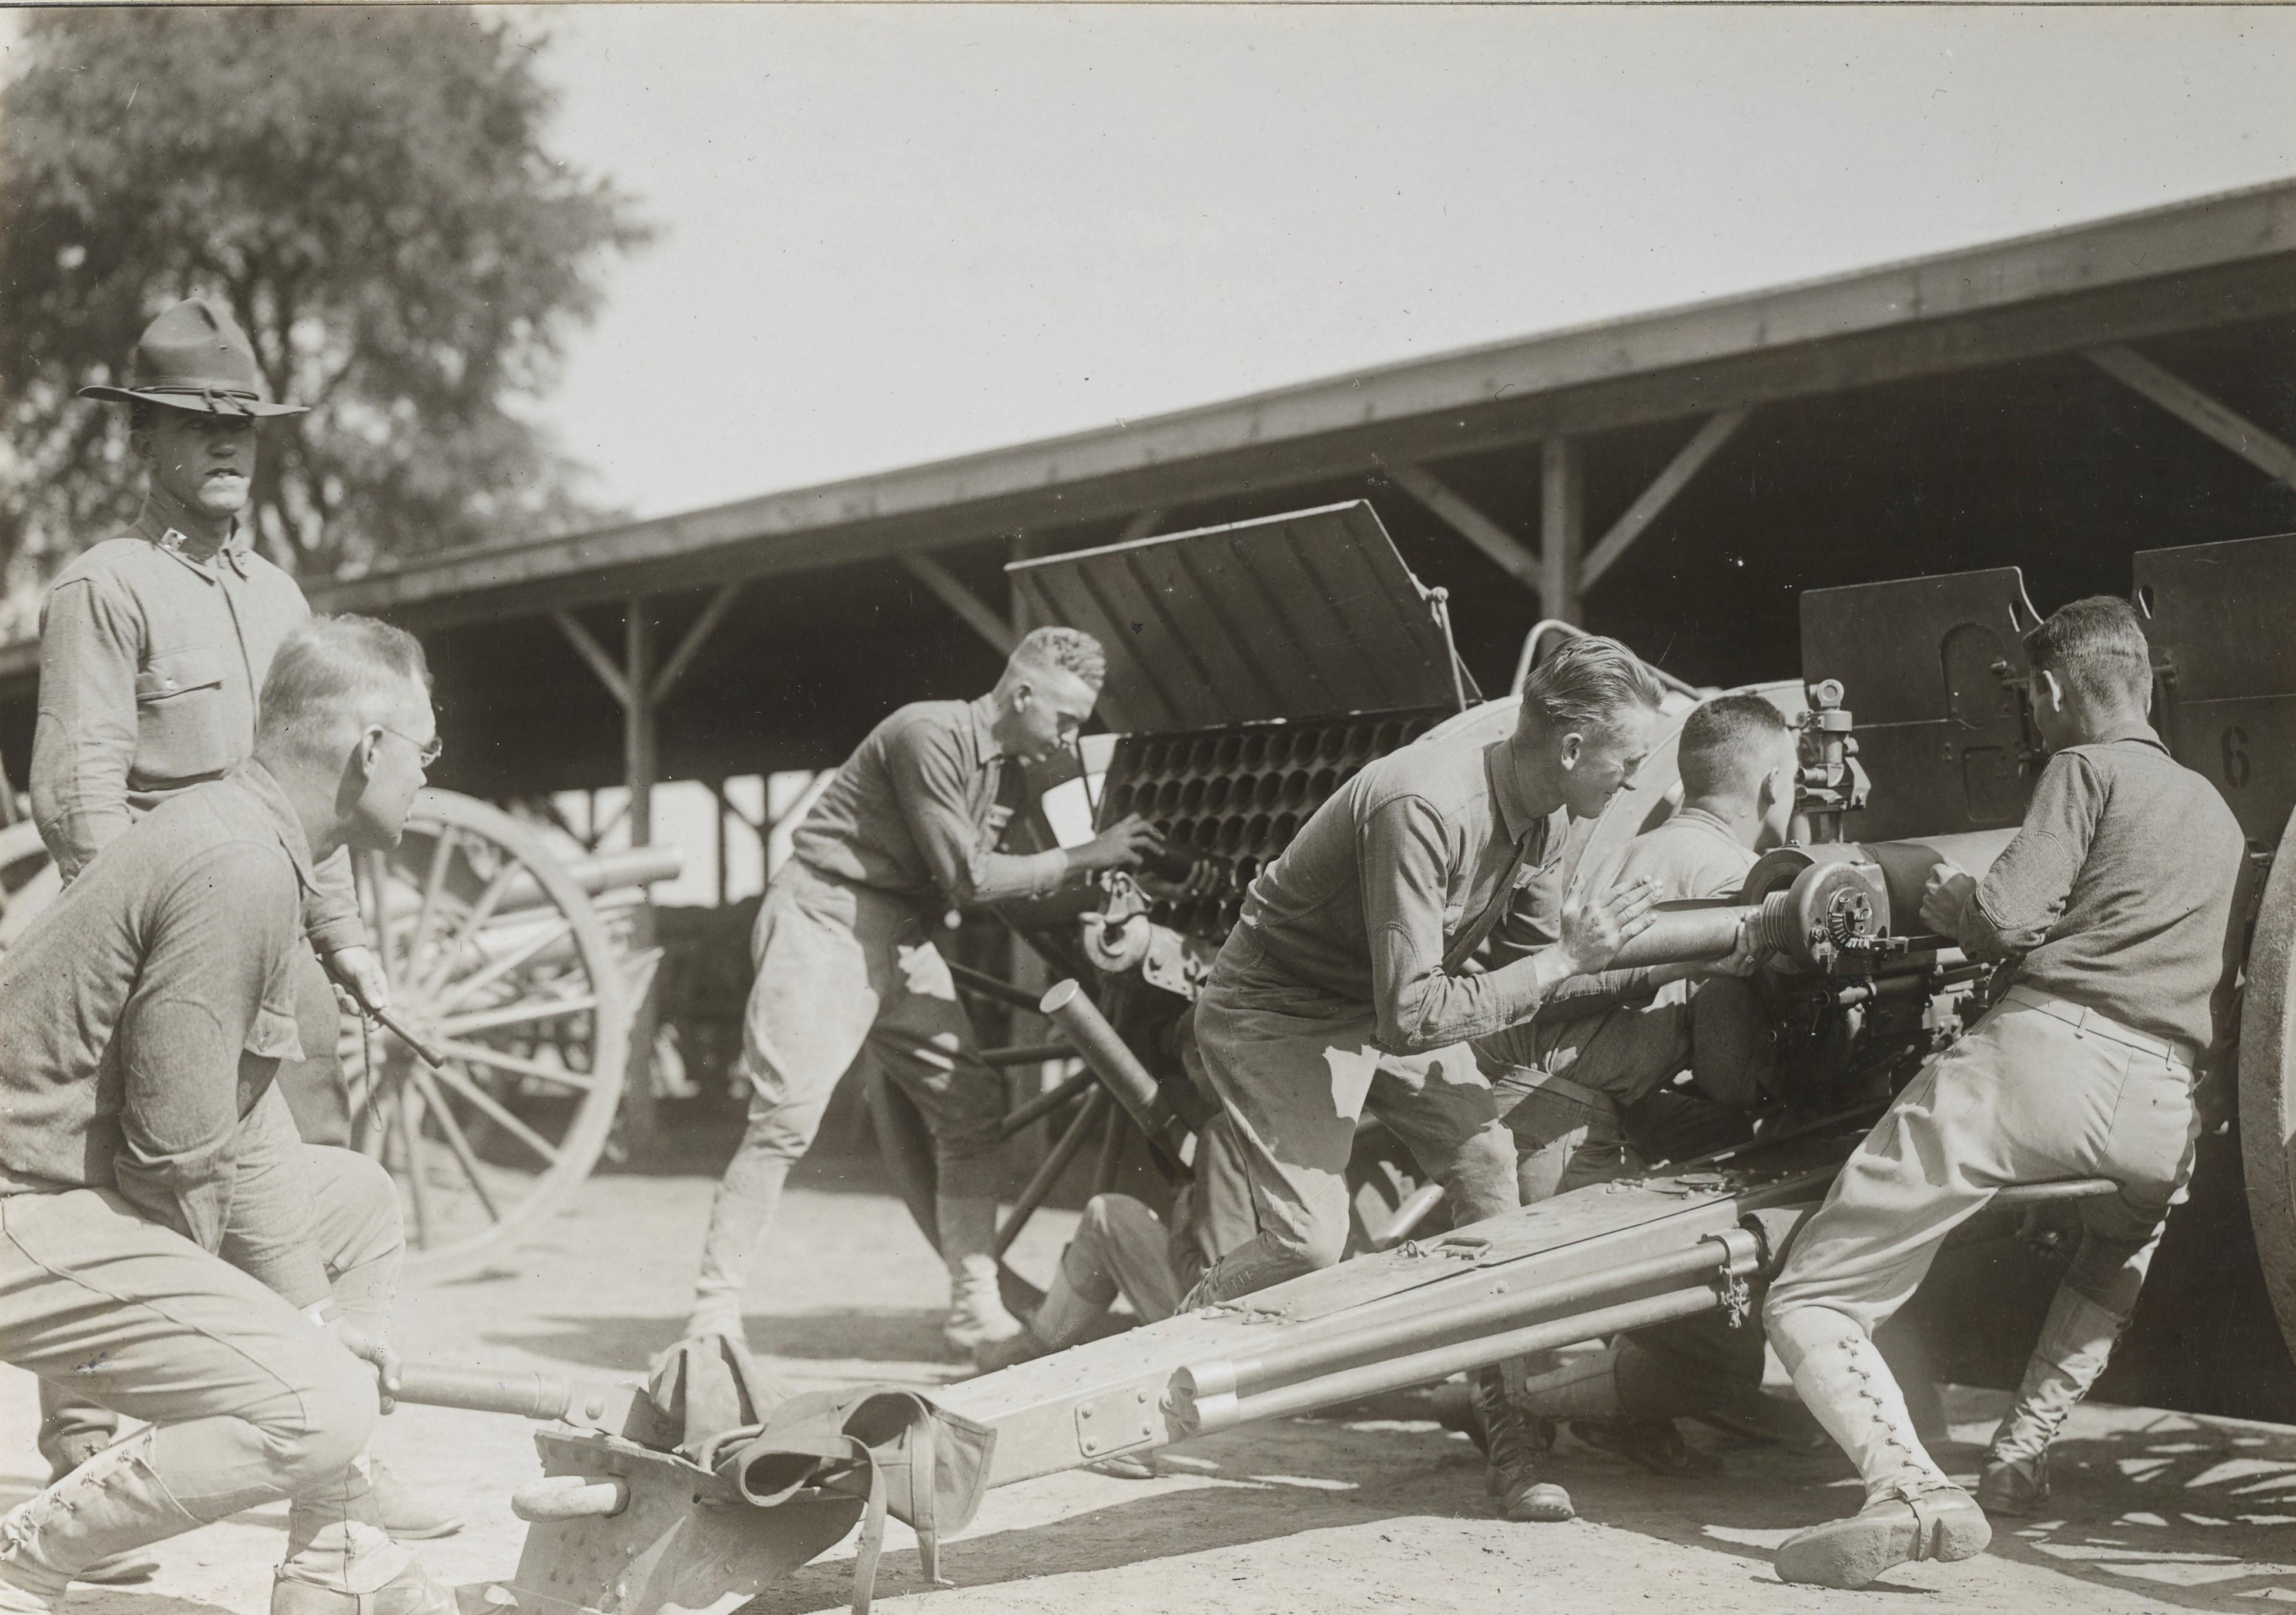 Entrainement des artilleurs au camp Zachary Taylor (Kentucky) en 1917 NARA165-WW-141B-025